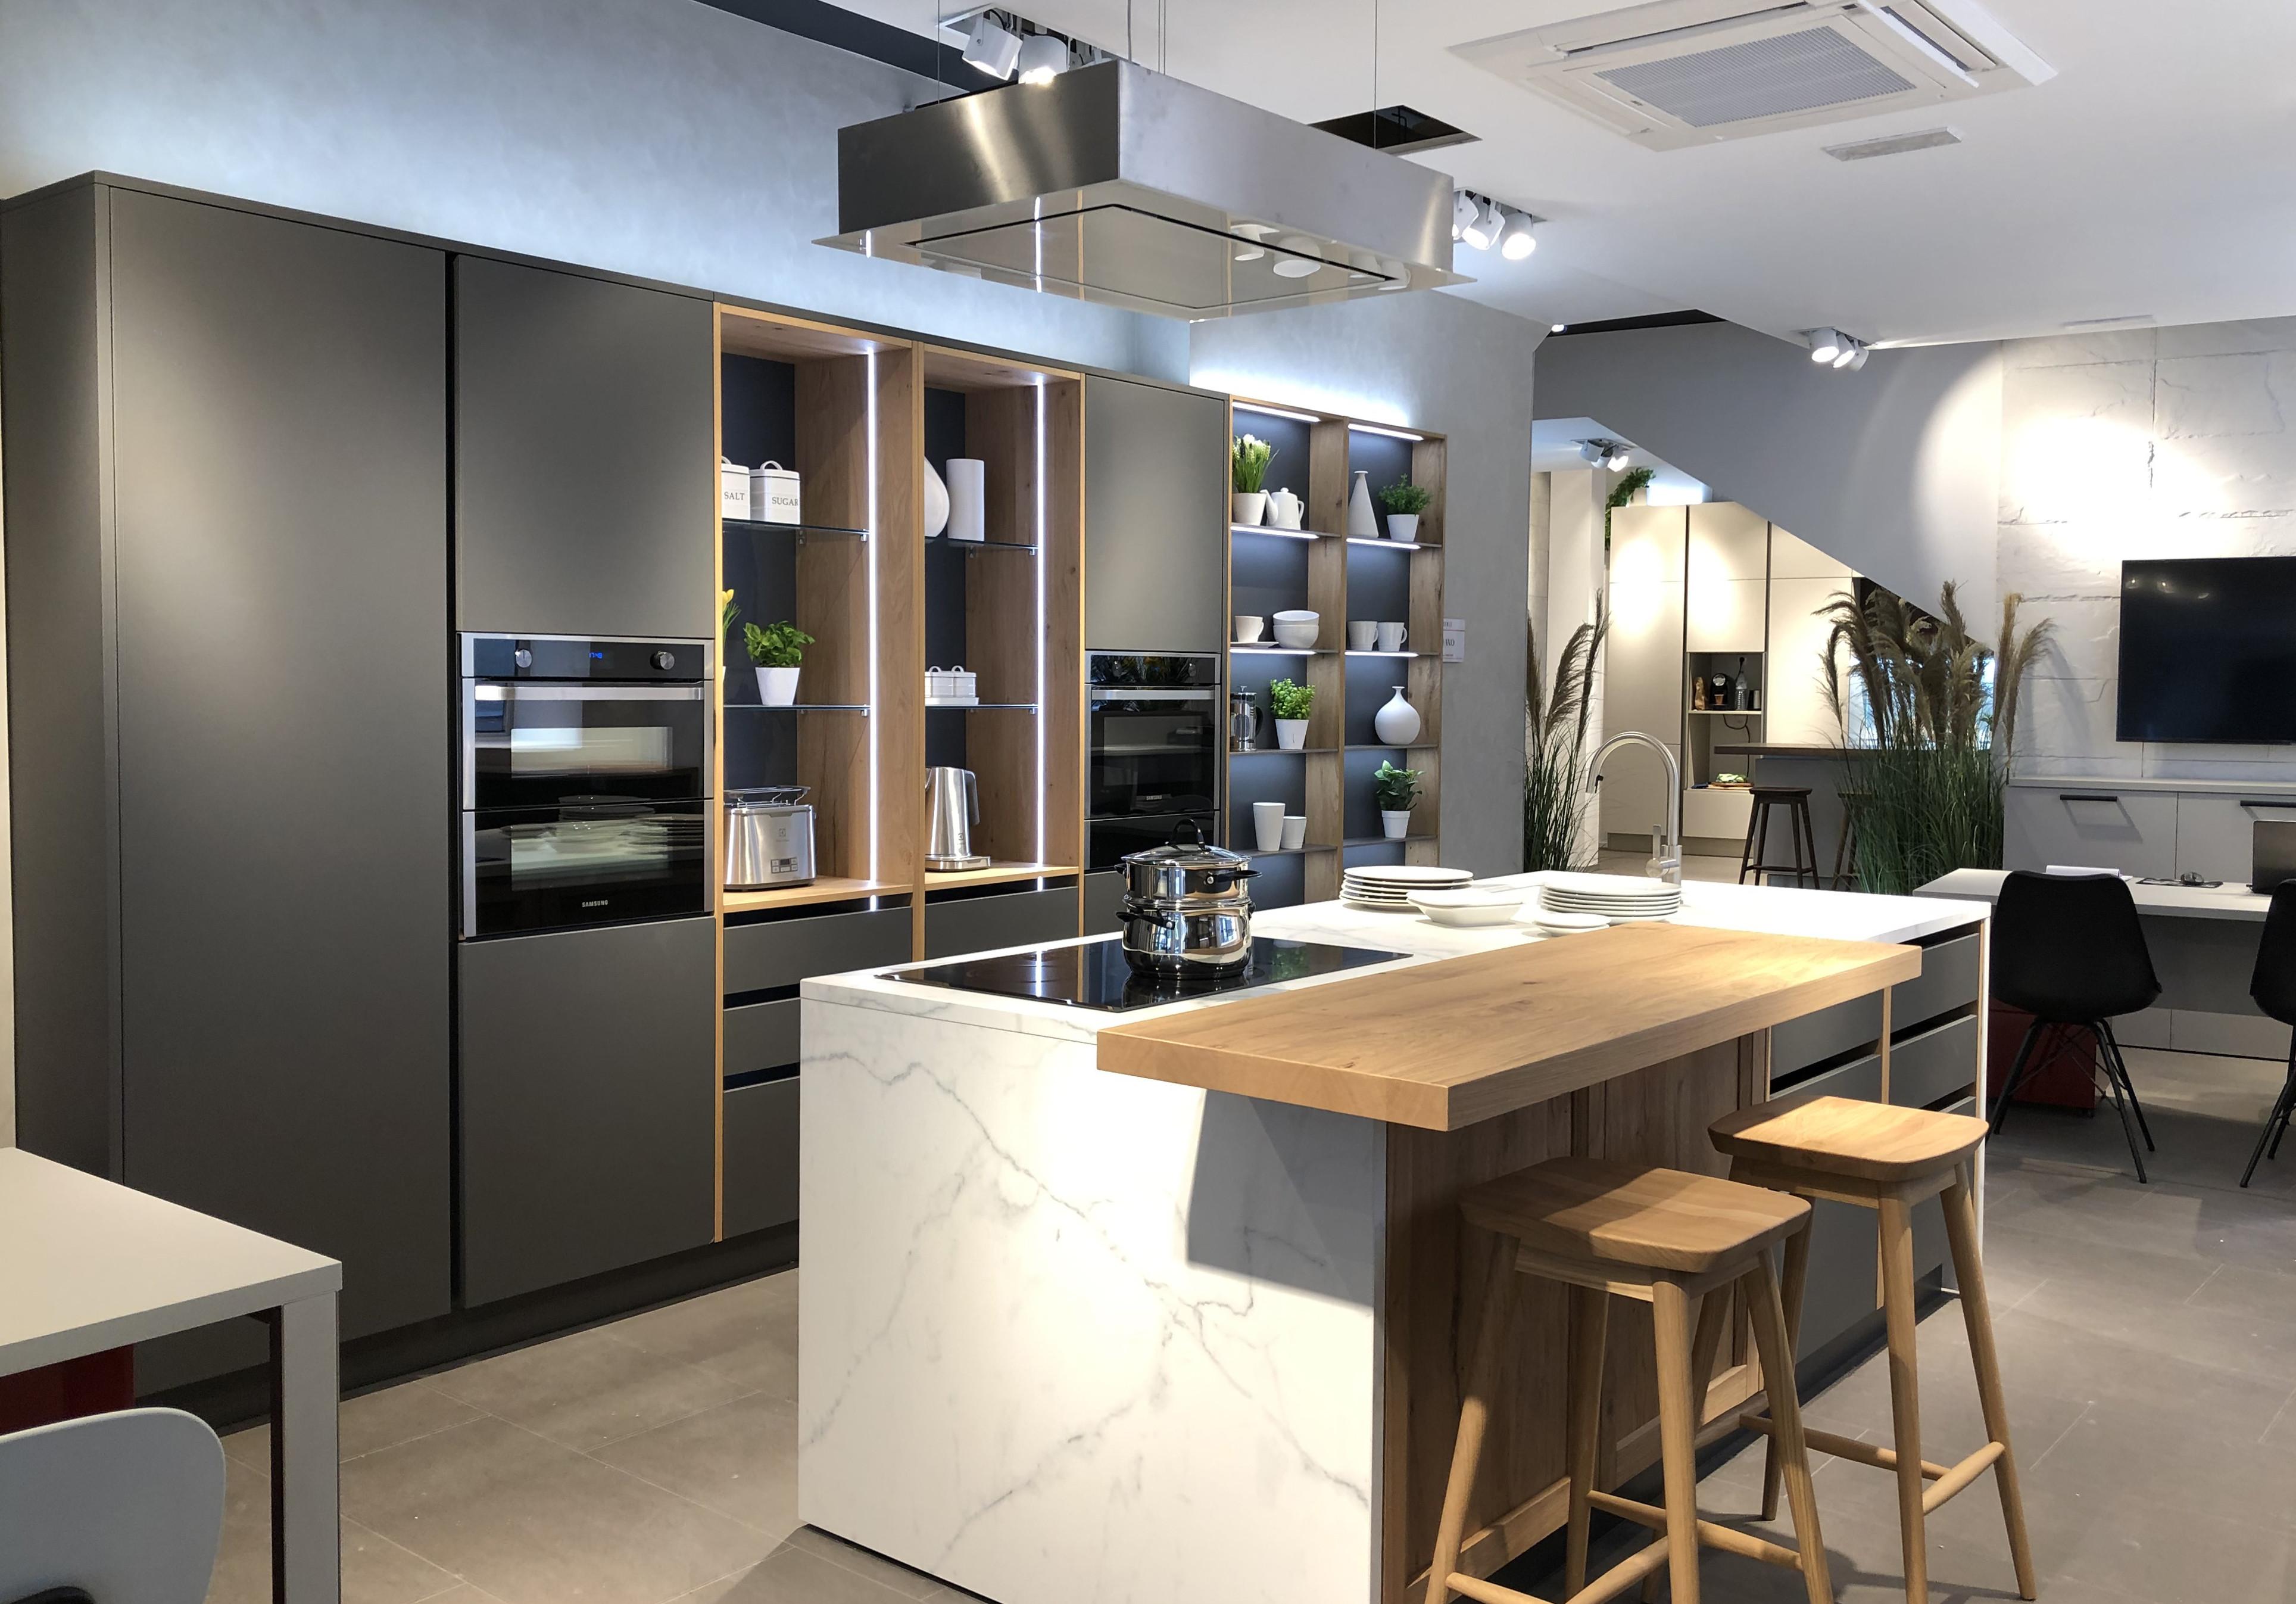 Apre A Parigi Il Nuovo Showroom Veneta Cucine Veneta Cucine